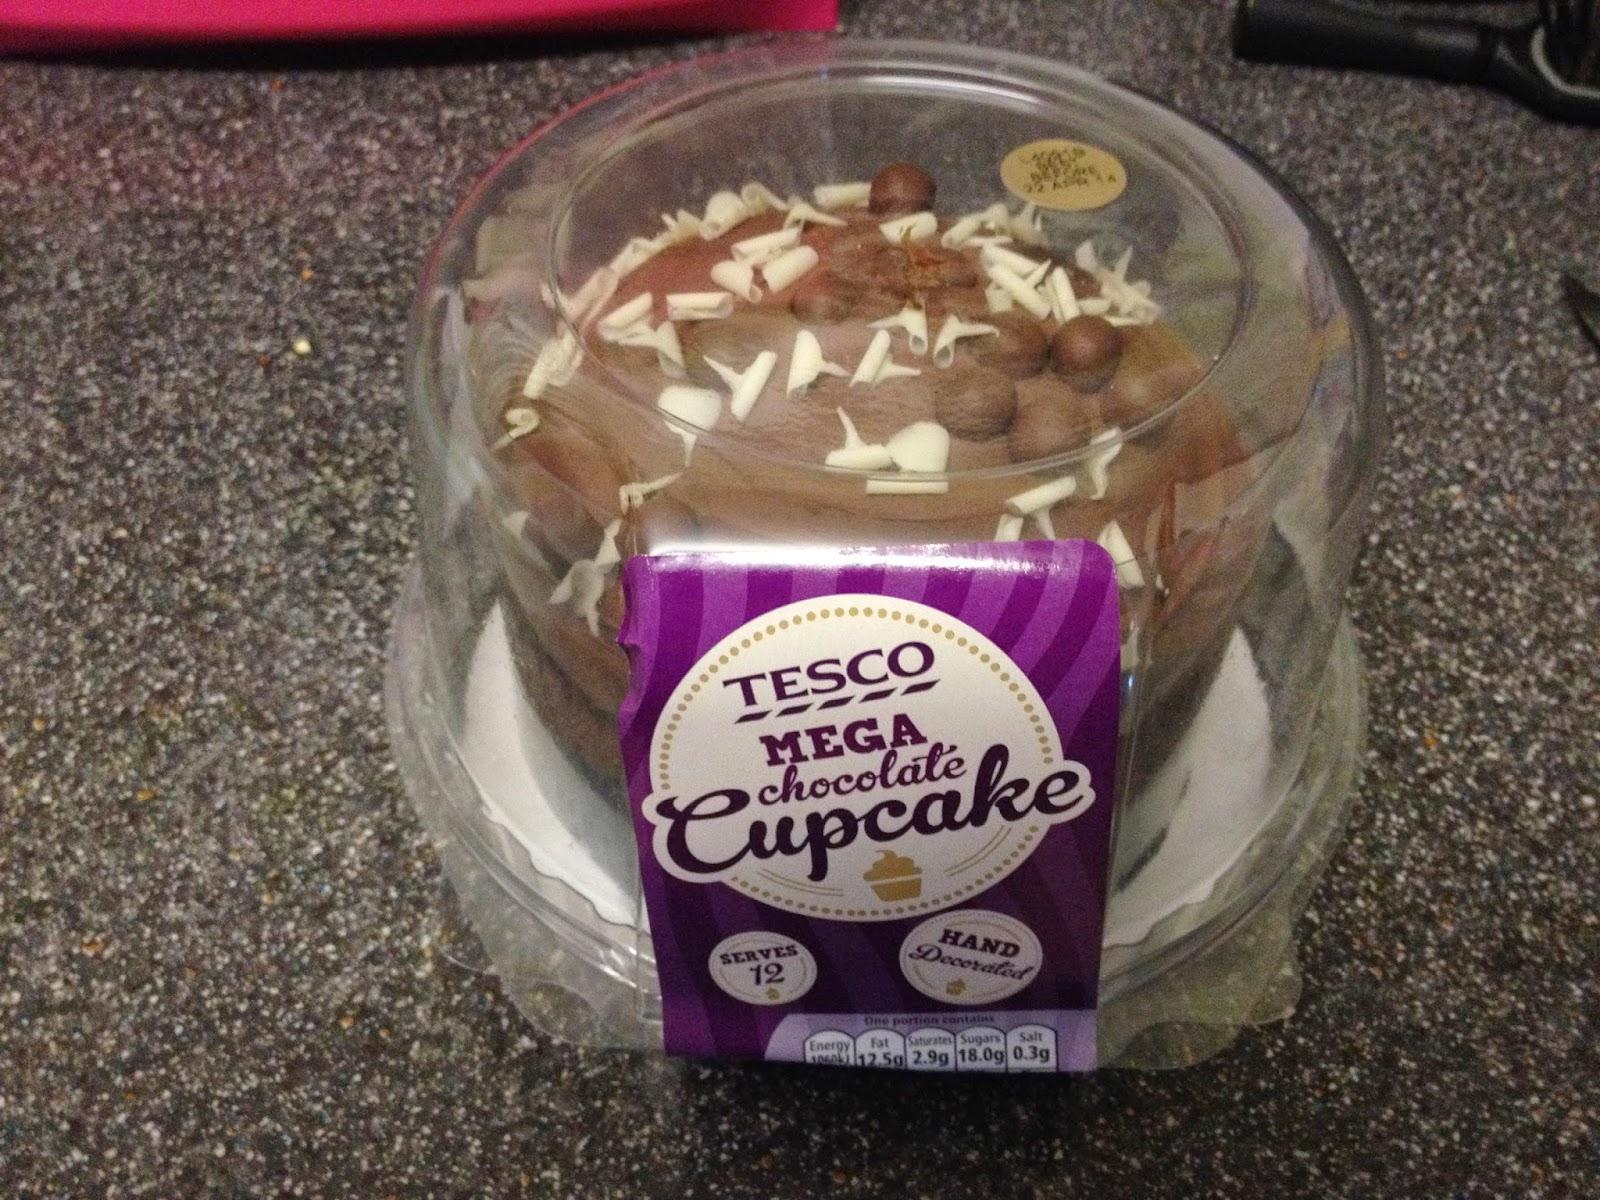 Print photo on cake tesco Where can i buy a